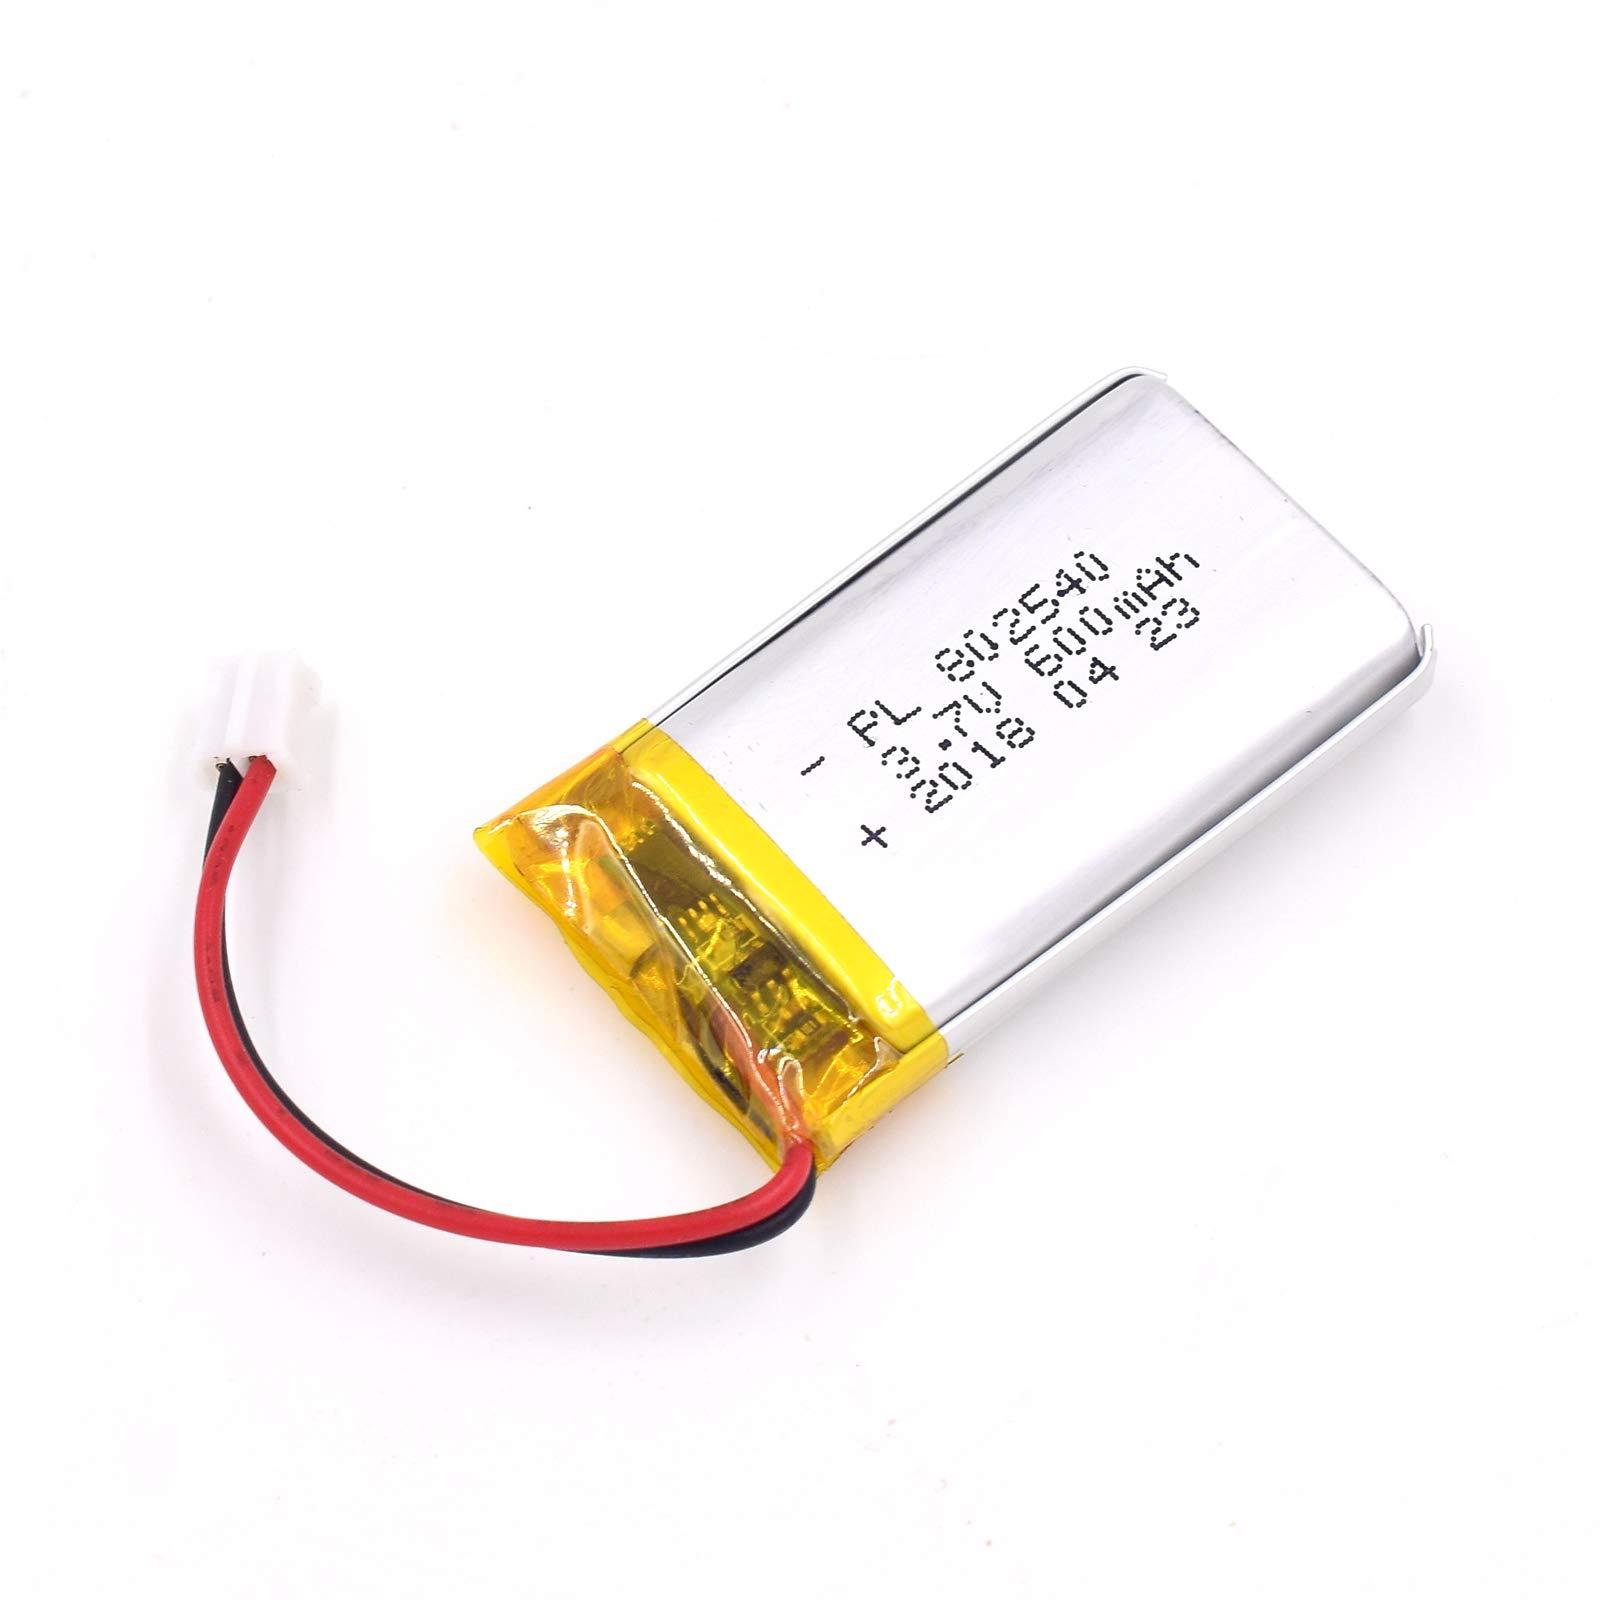 Bateria Lipo 3.7V 600mAh 802540 Recargable JST Conector